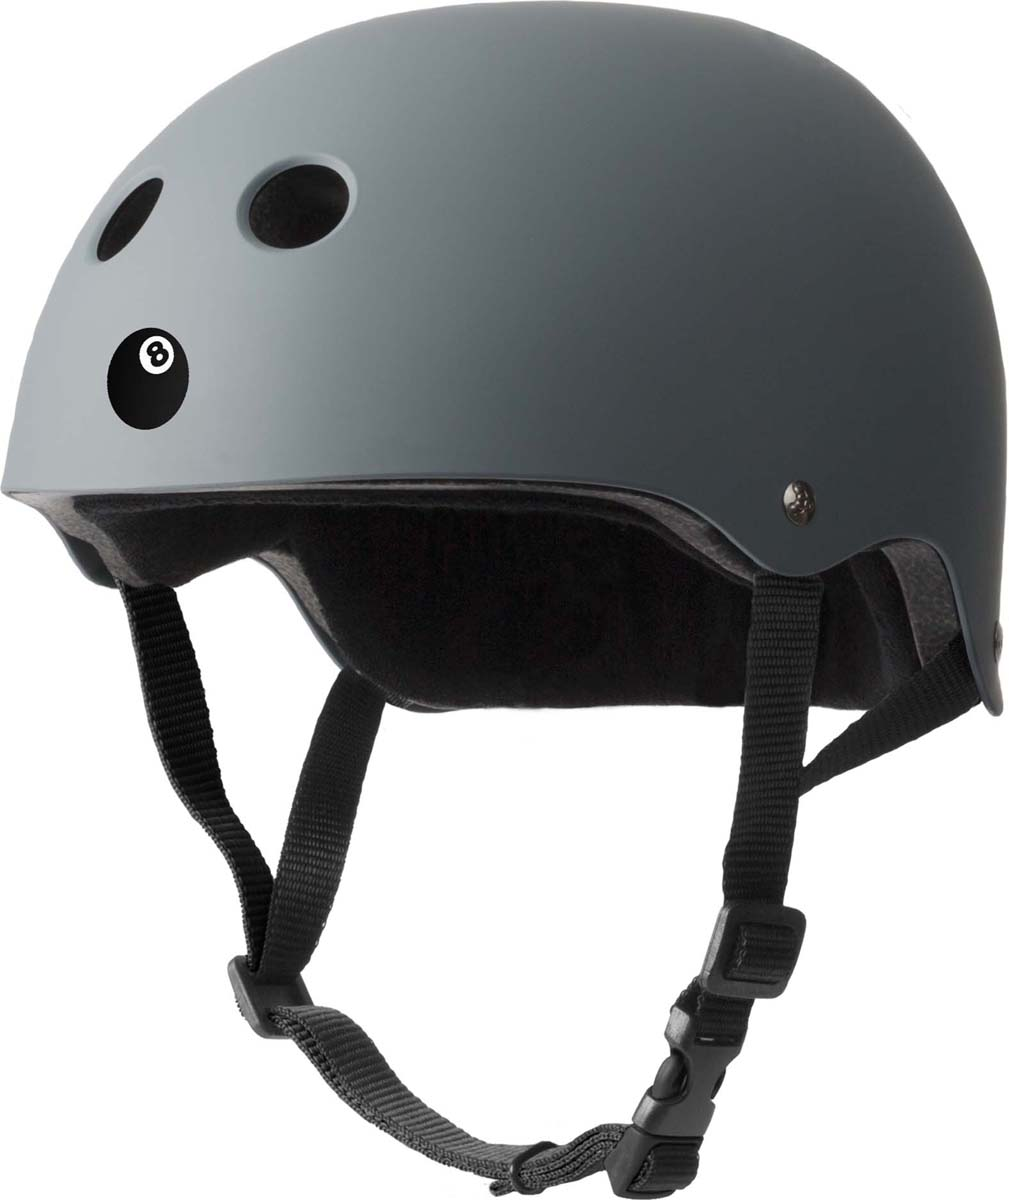 Шлем Eight Ball, цвет: серый. Размер L (8+) babyonlinedress серый сша 8 великобритания 12 ес 38